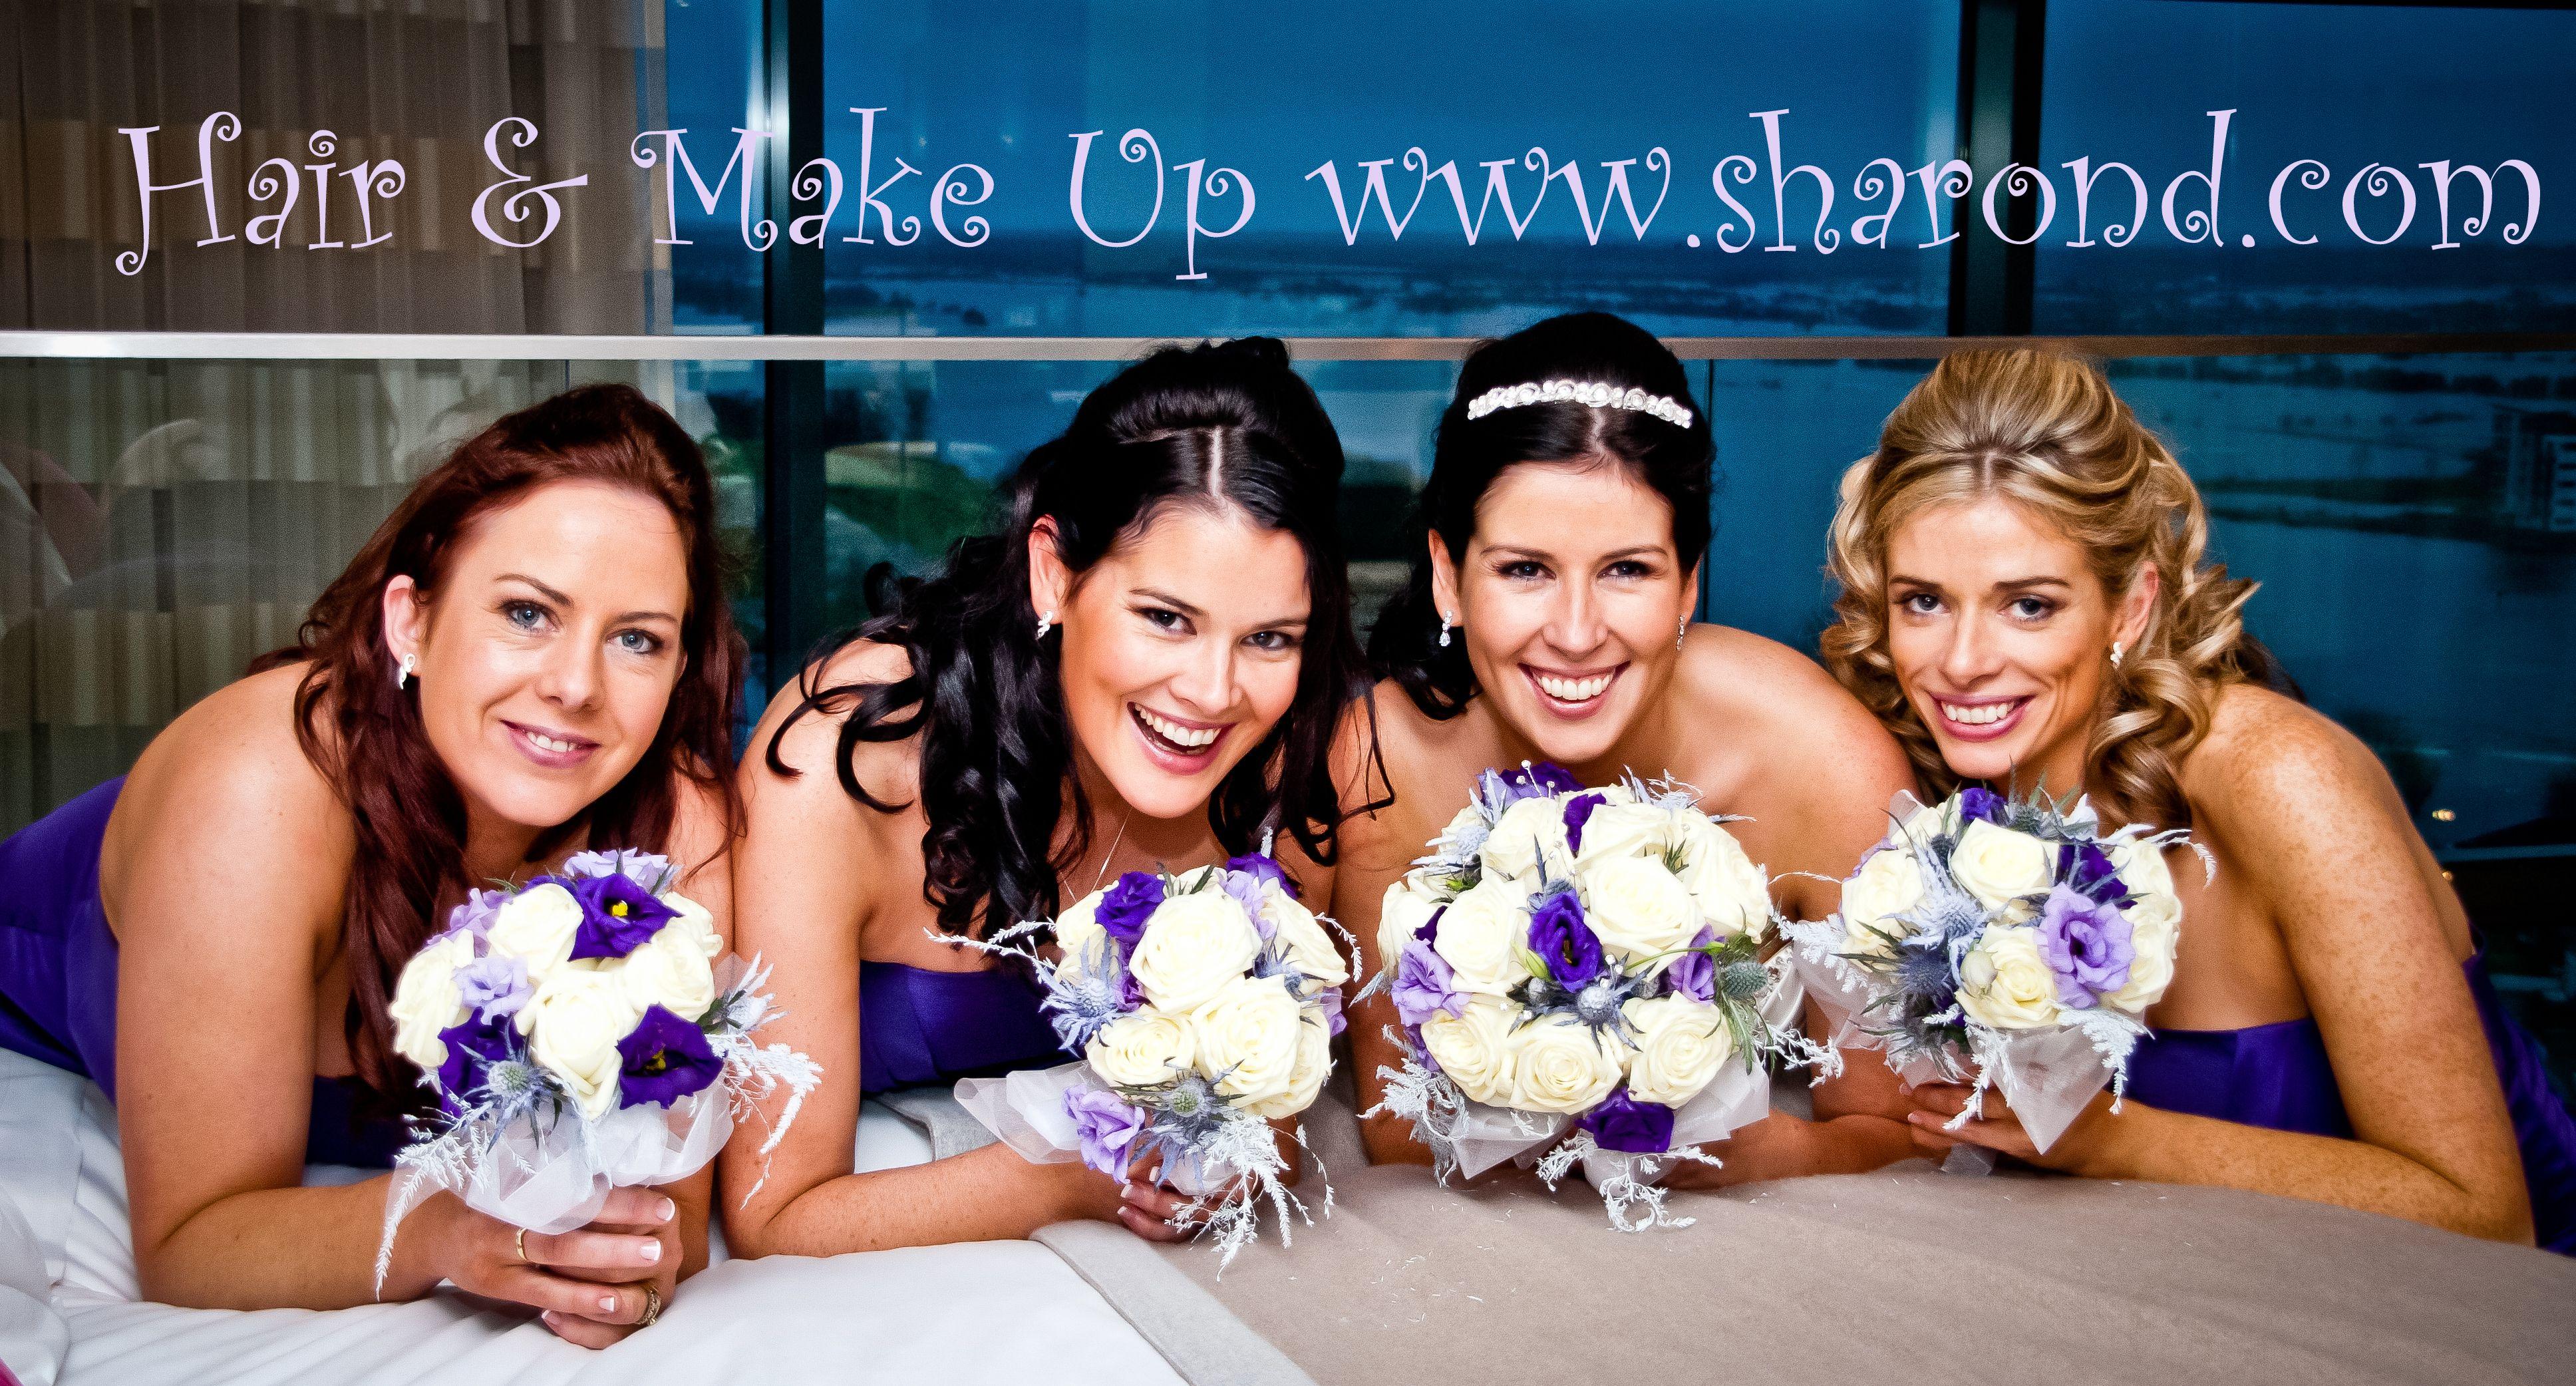 Bridal hair, Make Up & Tans - www.sharond.com photo by hurson.com